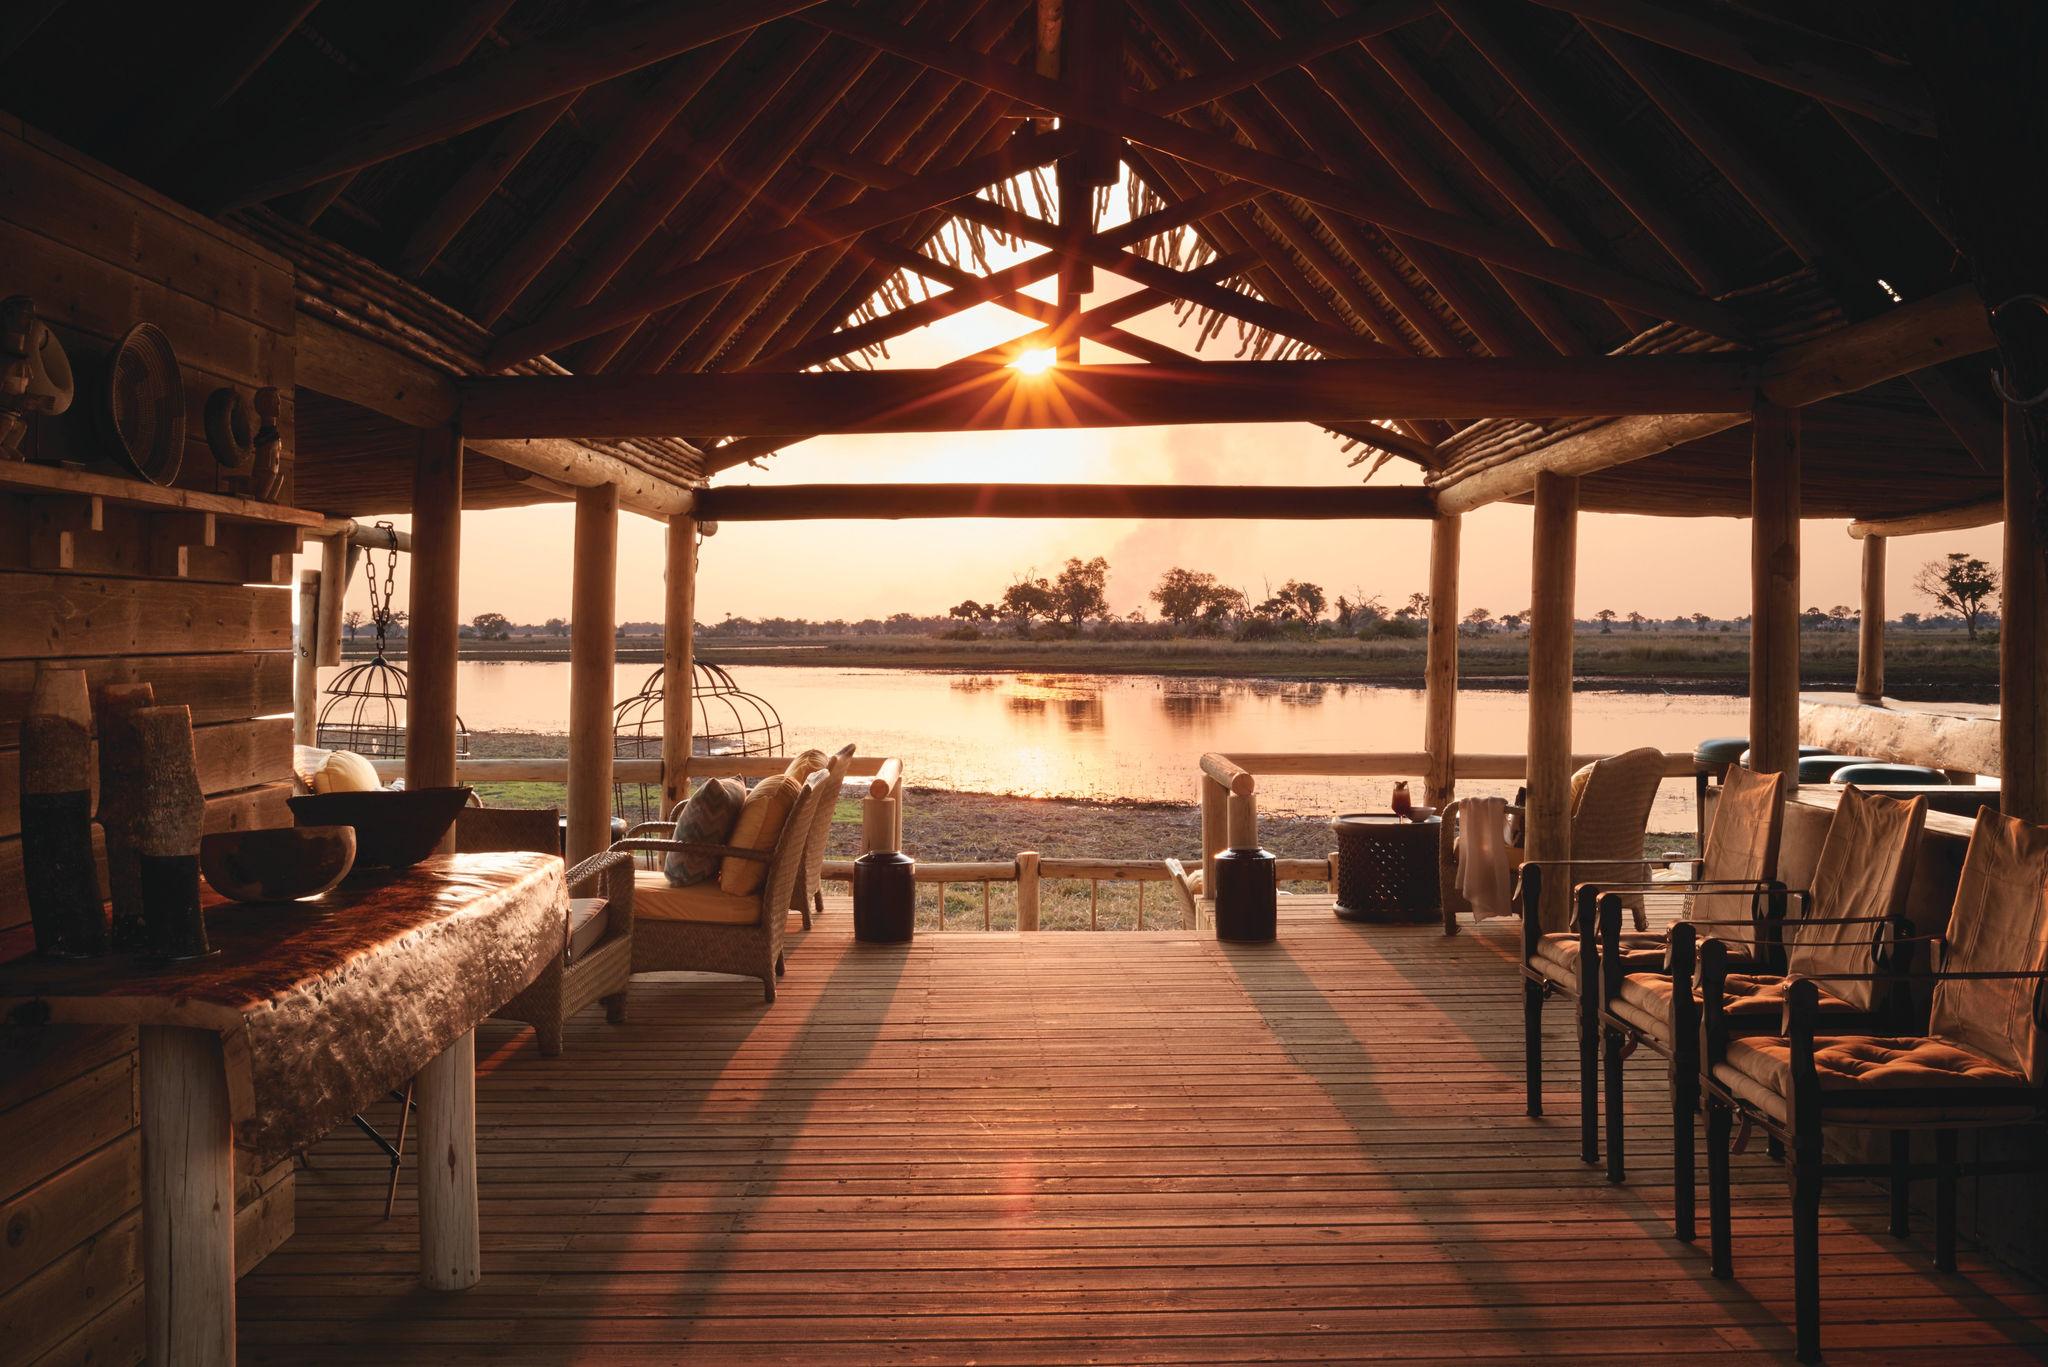 Best-eco-friendly-lodges-in-Africa-Belmond-Eagle-Island-Lodge